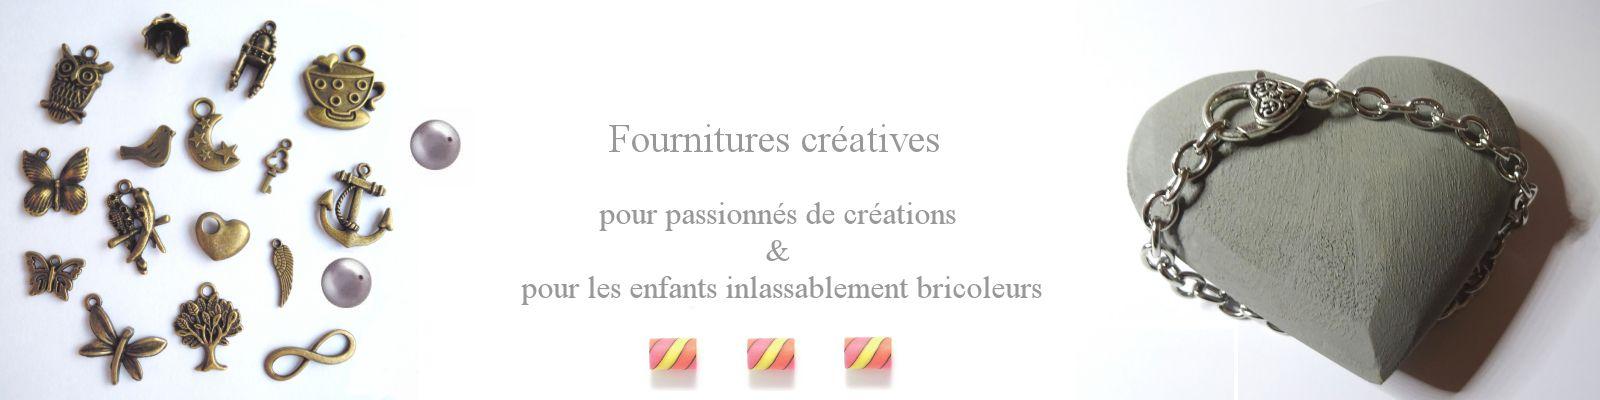 Magasin de fournitures créatives